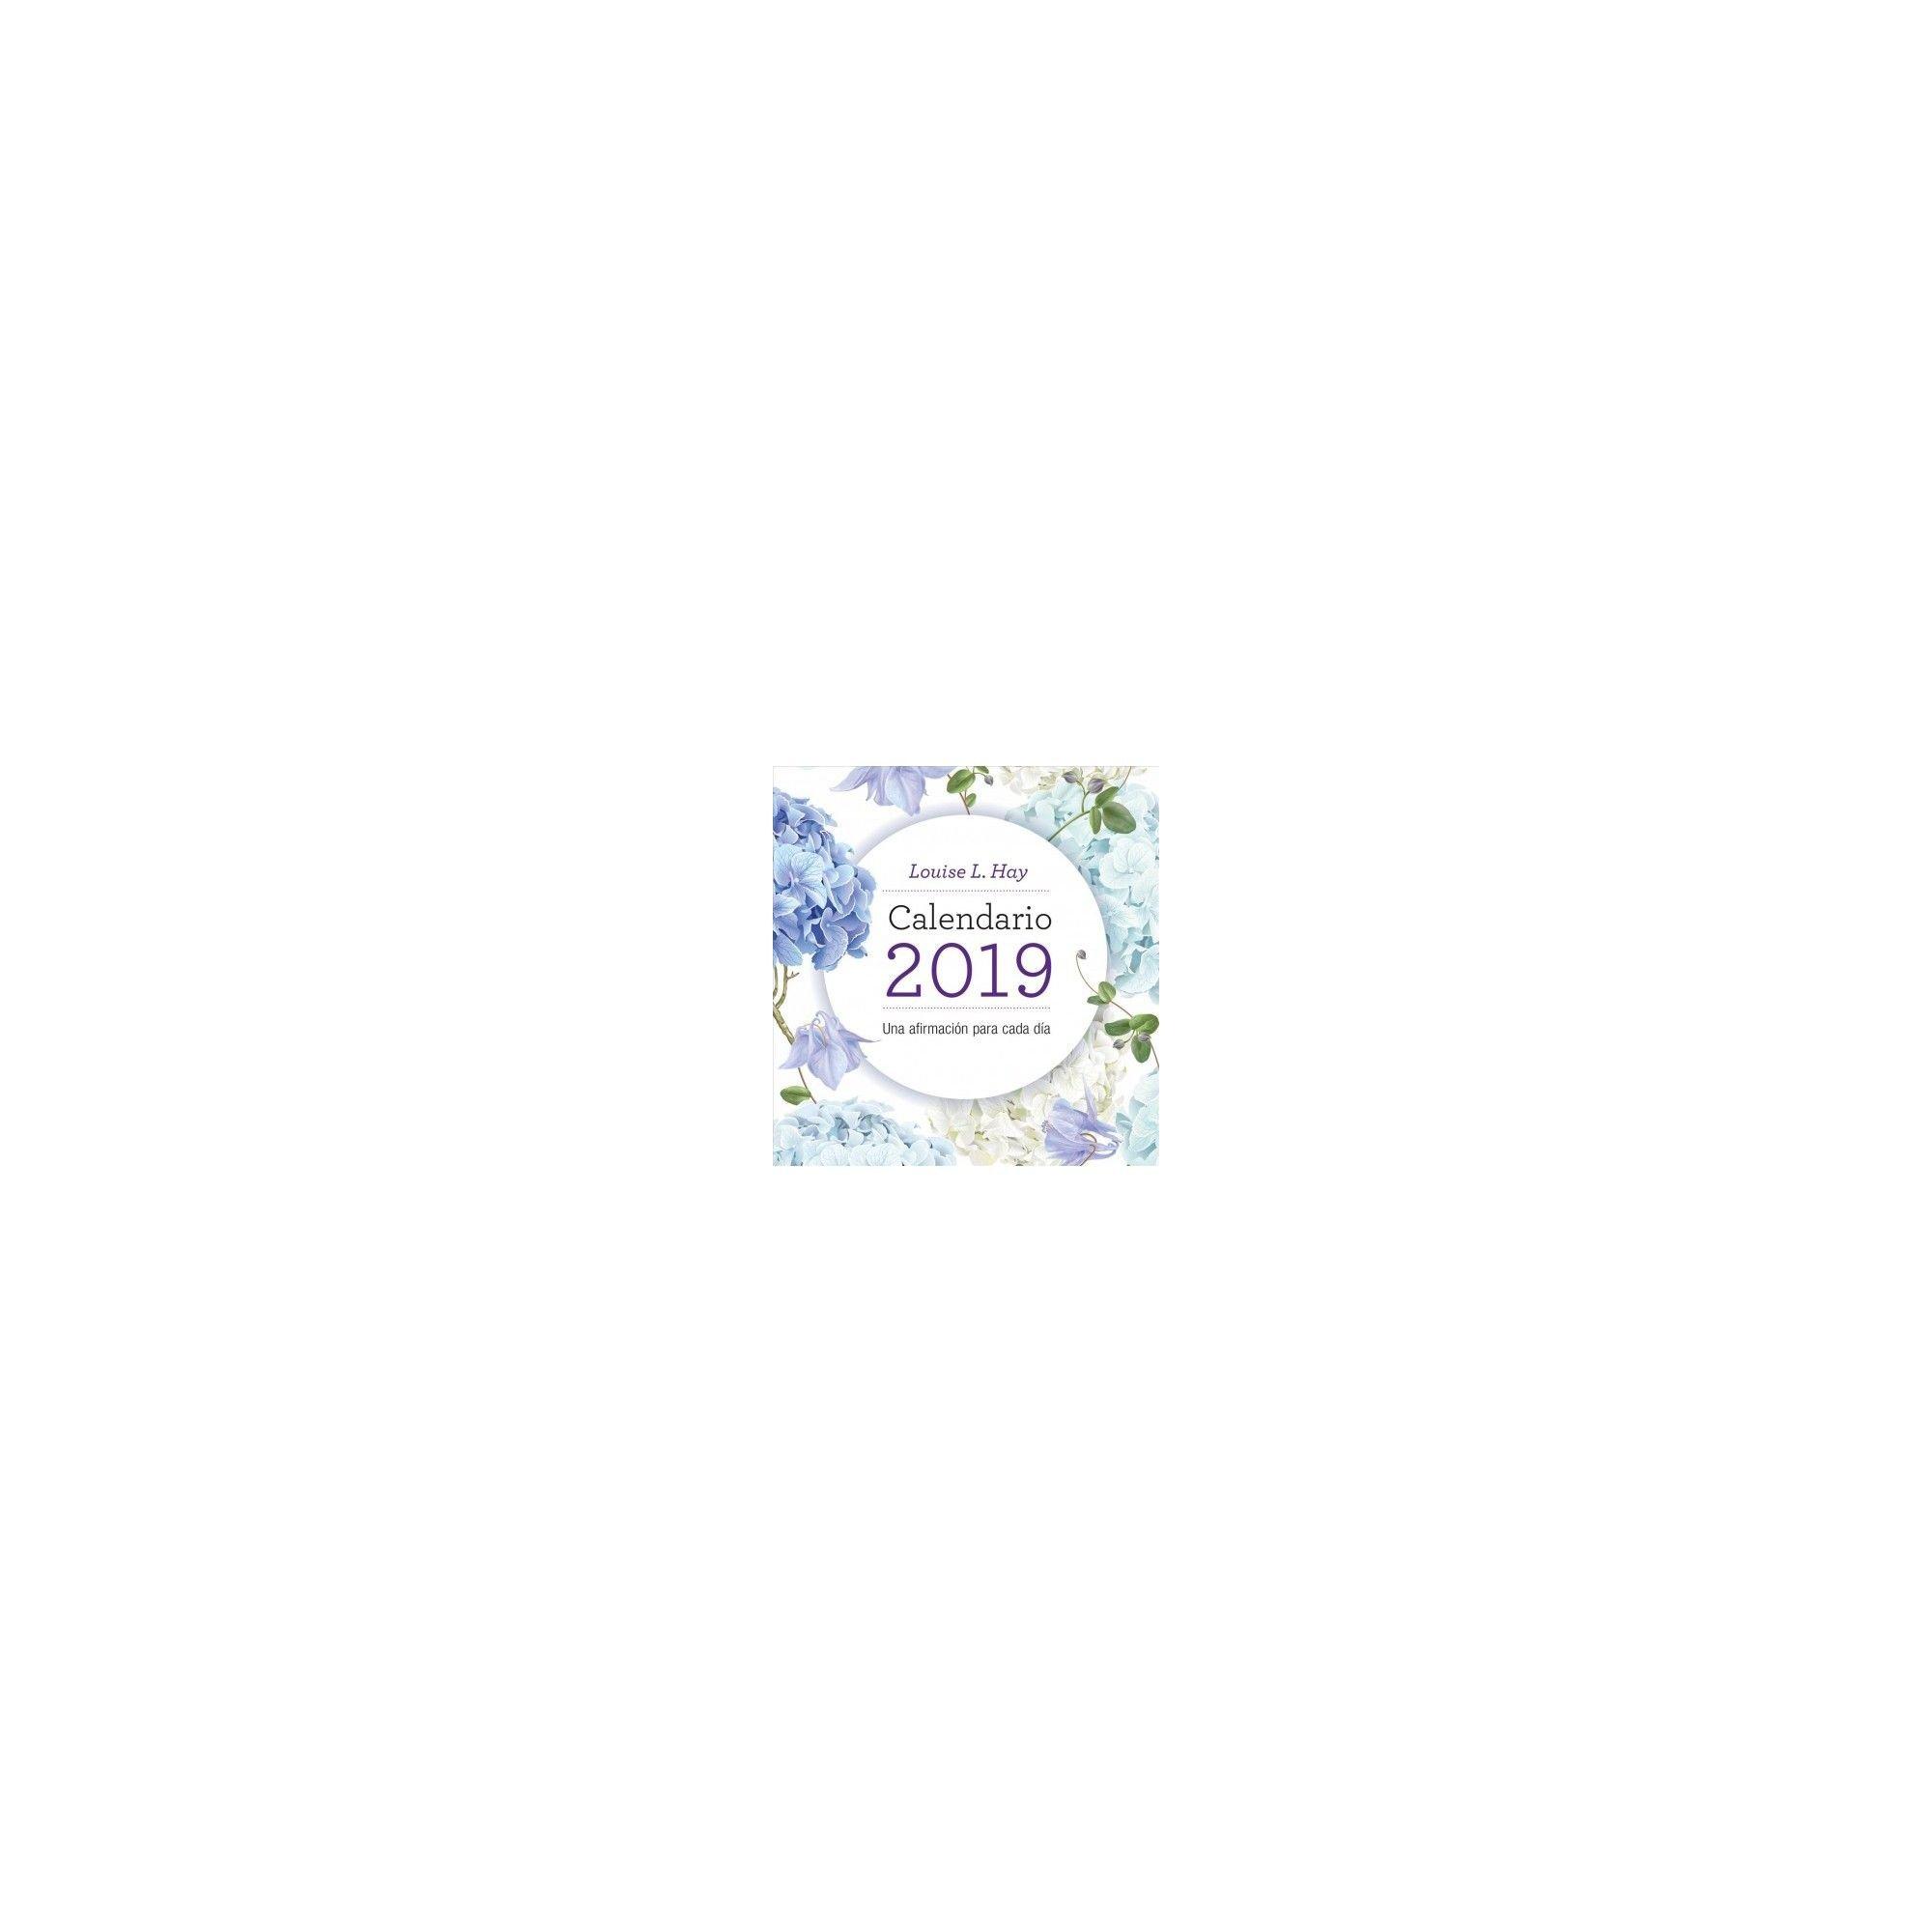 Calendario Louise L. Hay 2019 / Louise L. Hay 2019 Calendar : Una Louise L Hay Calendar 2019